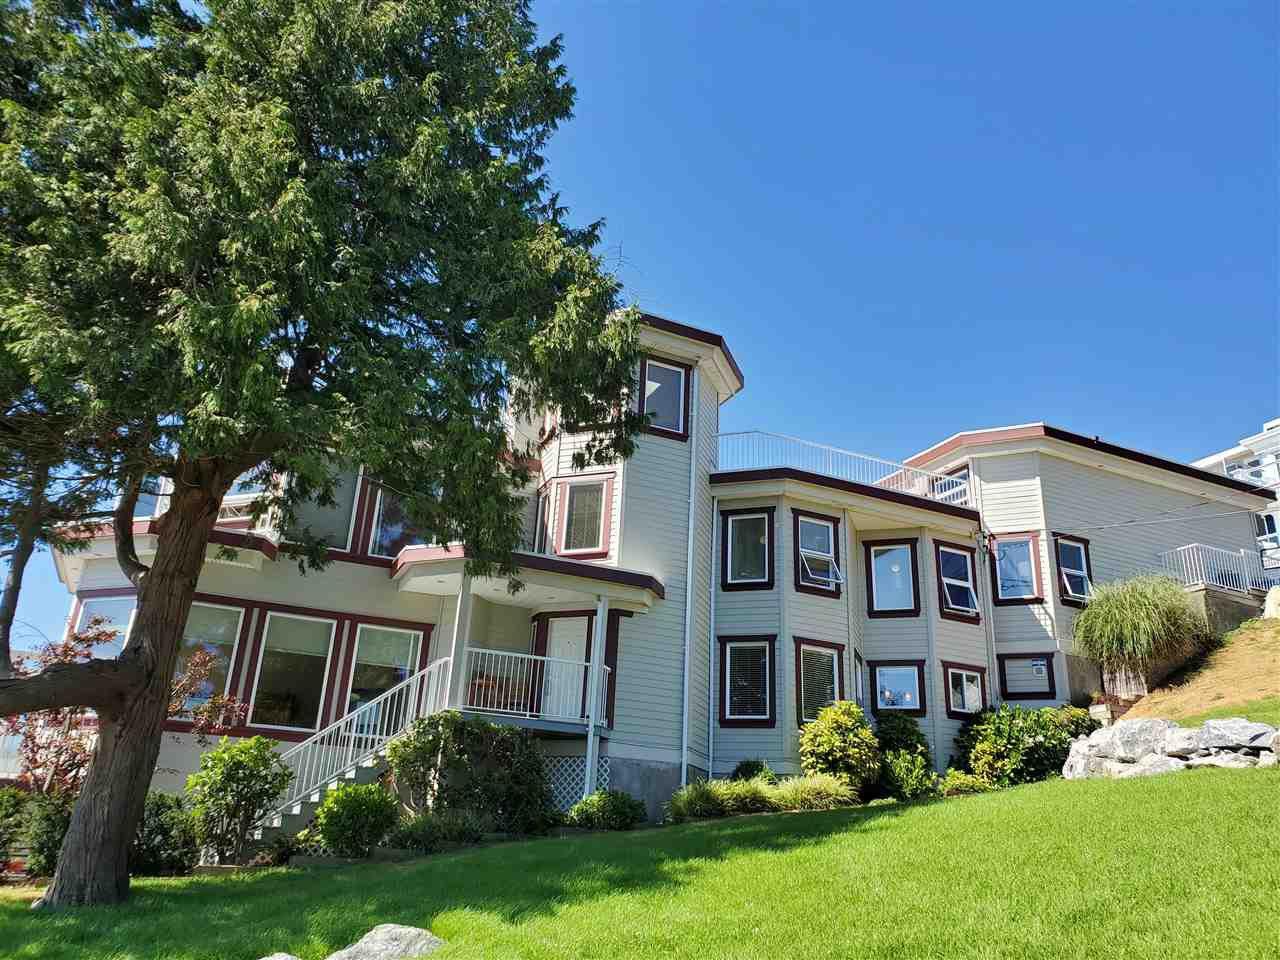 Photo 2: Photos: 15395 VICTORIA Avenue: White Rock House for sale (South Surrey White Rock)  : MLS®# R2476831